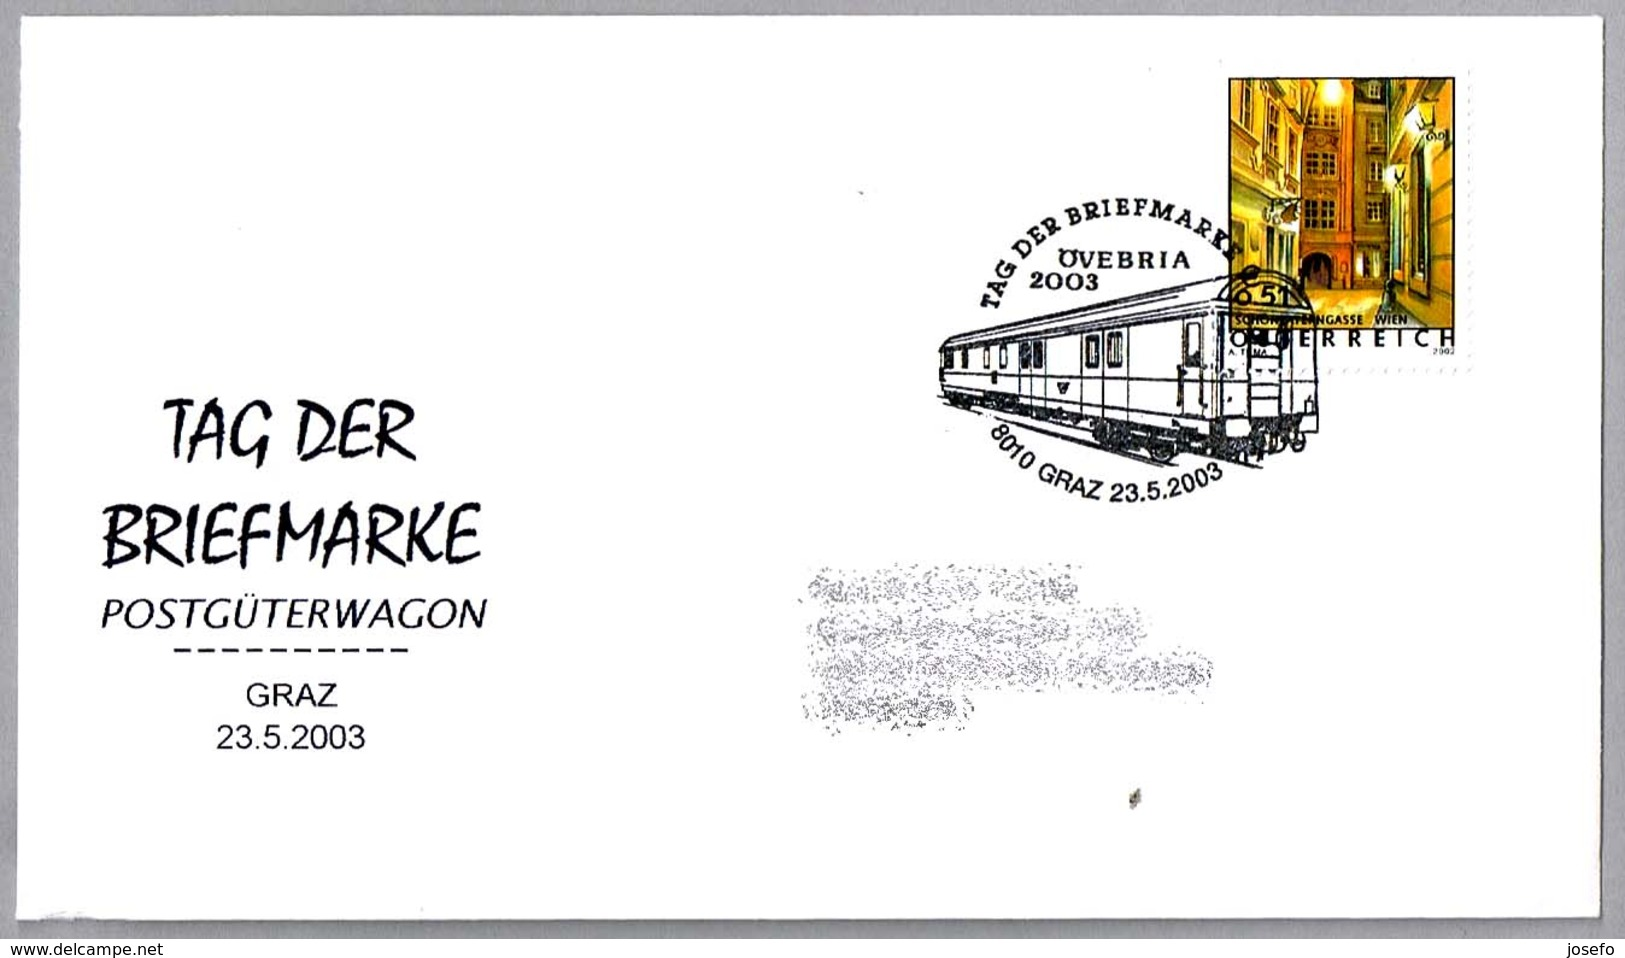 DIA DEL SELLO - VAGON POSTAL - POSTAL WAGON - POSTGÜTERWAGON. Graz 2003 - Correo Postal